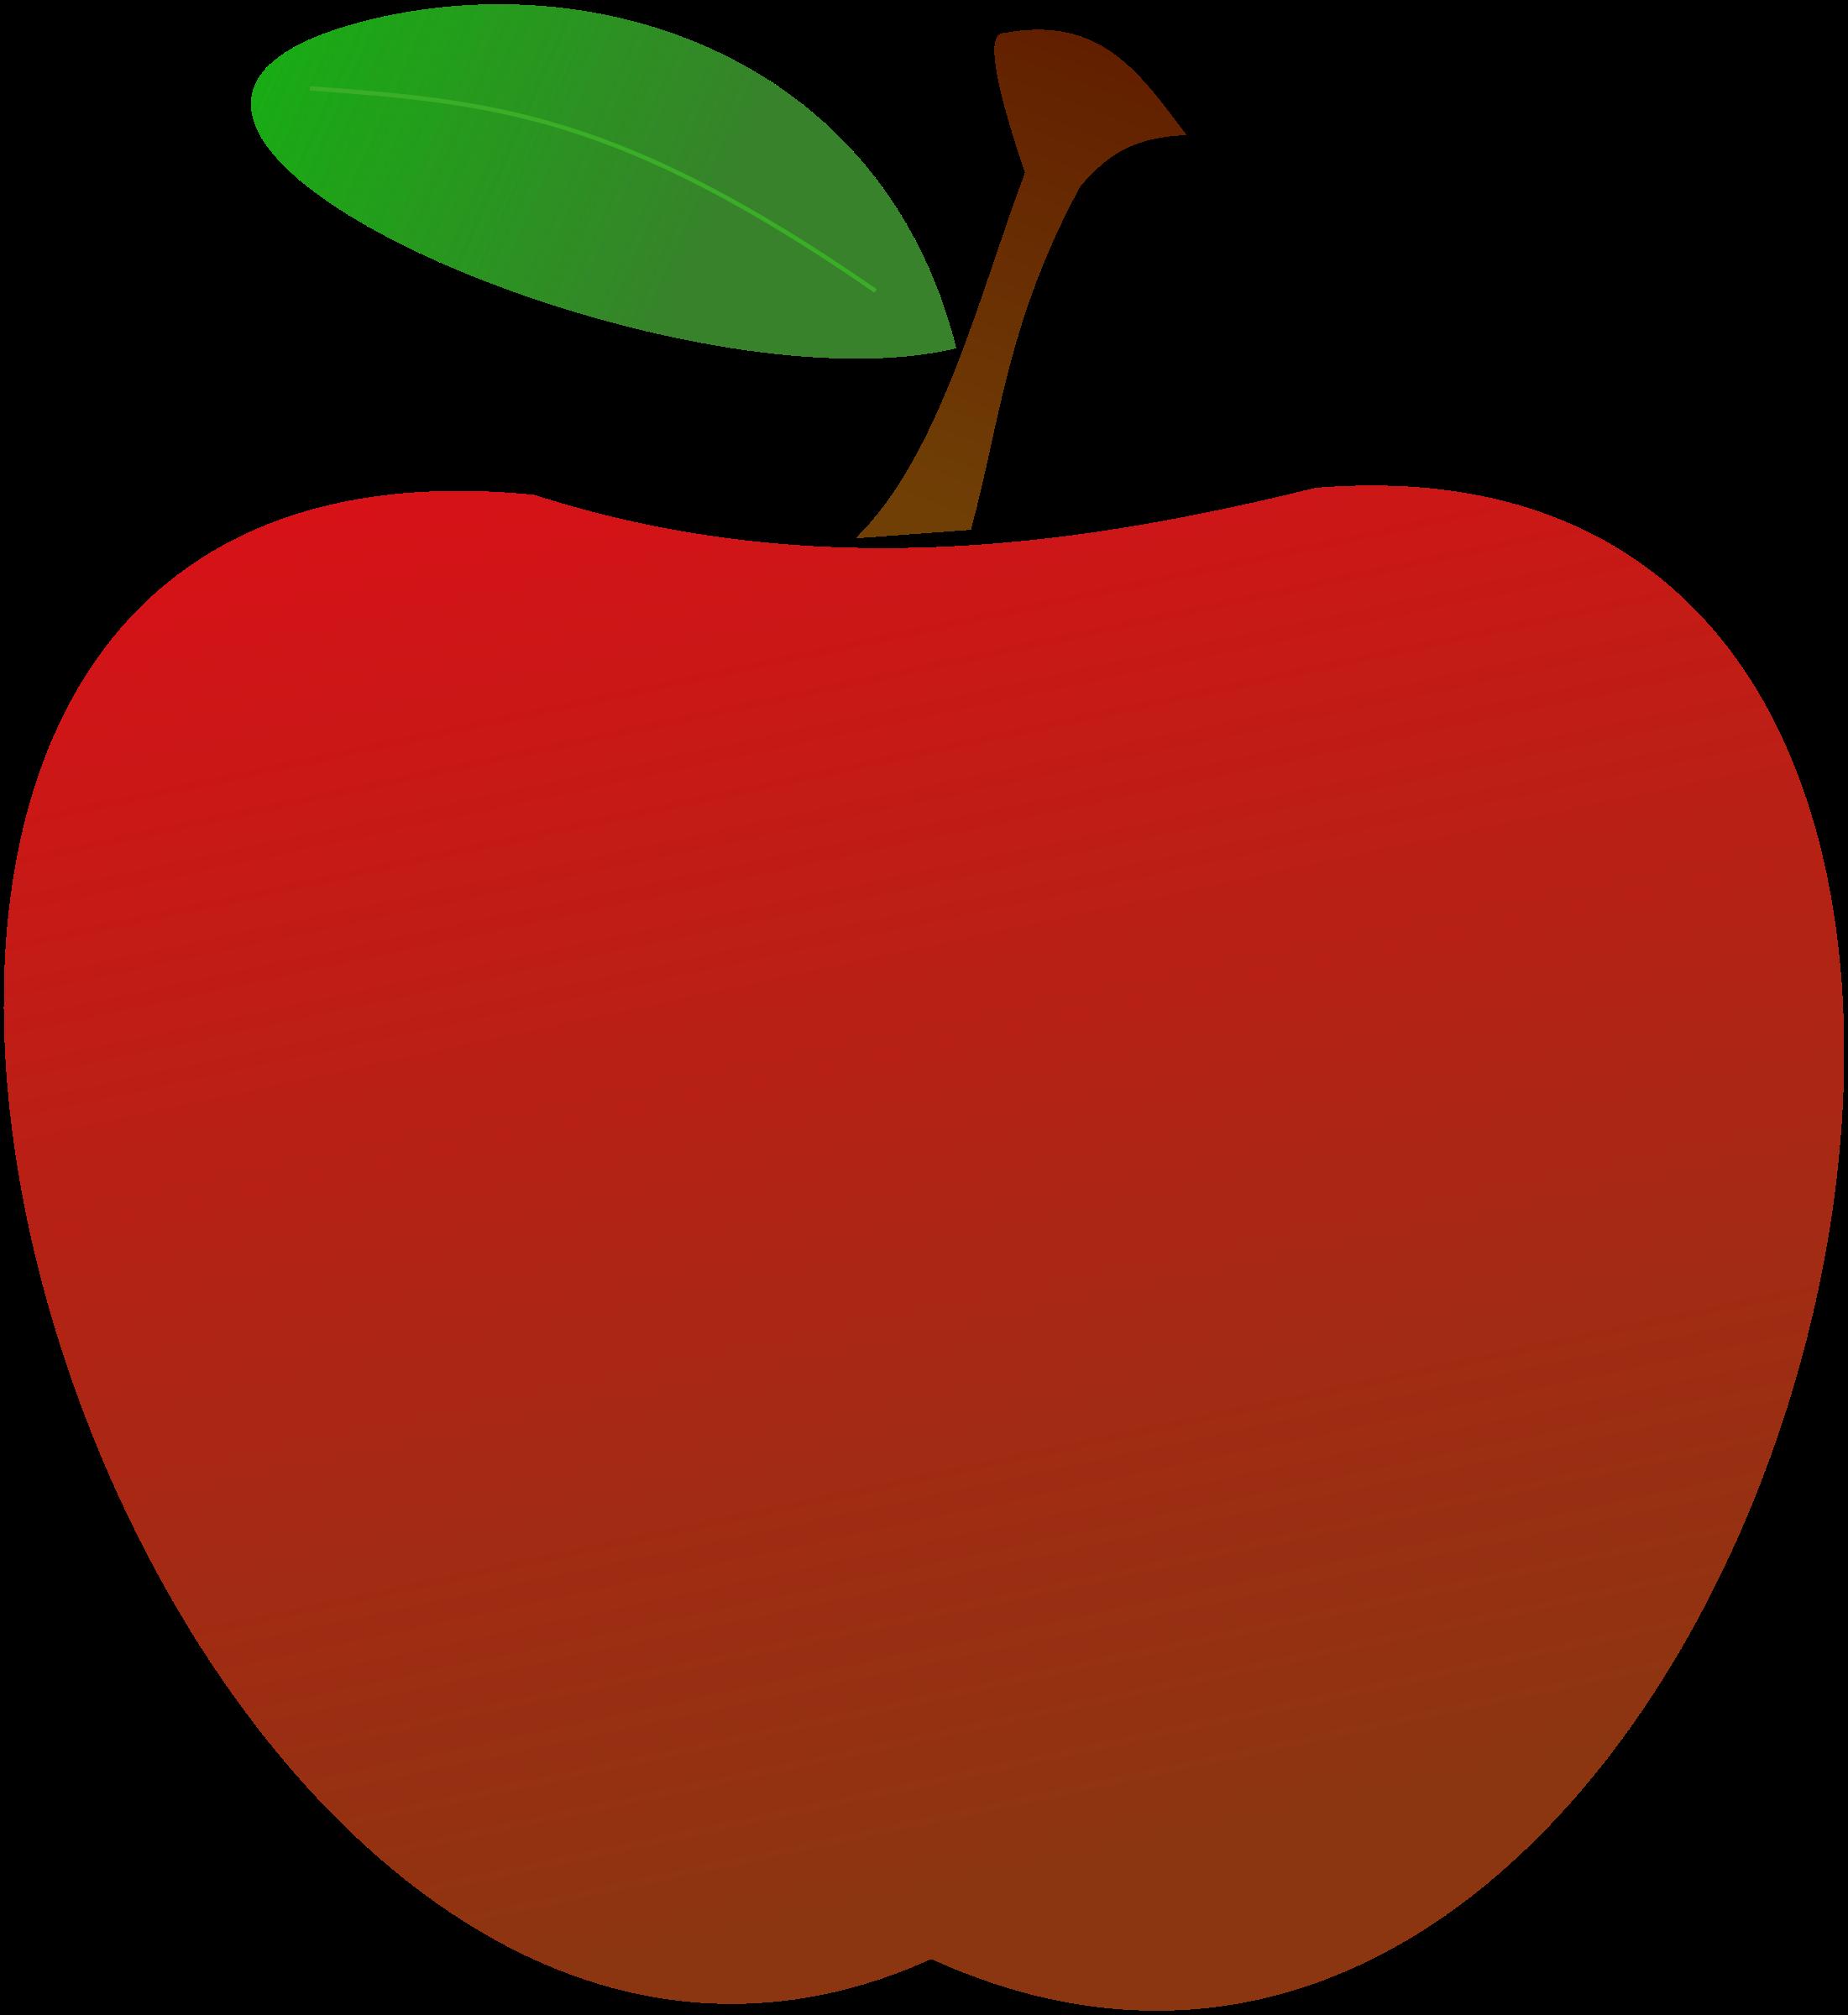 teacher apple clipart